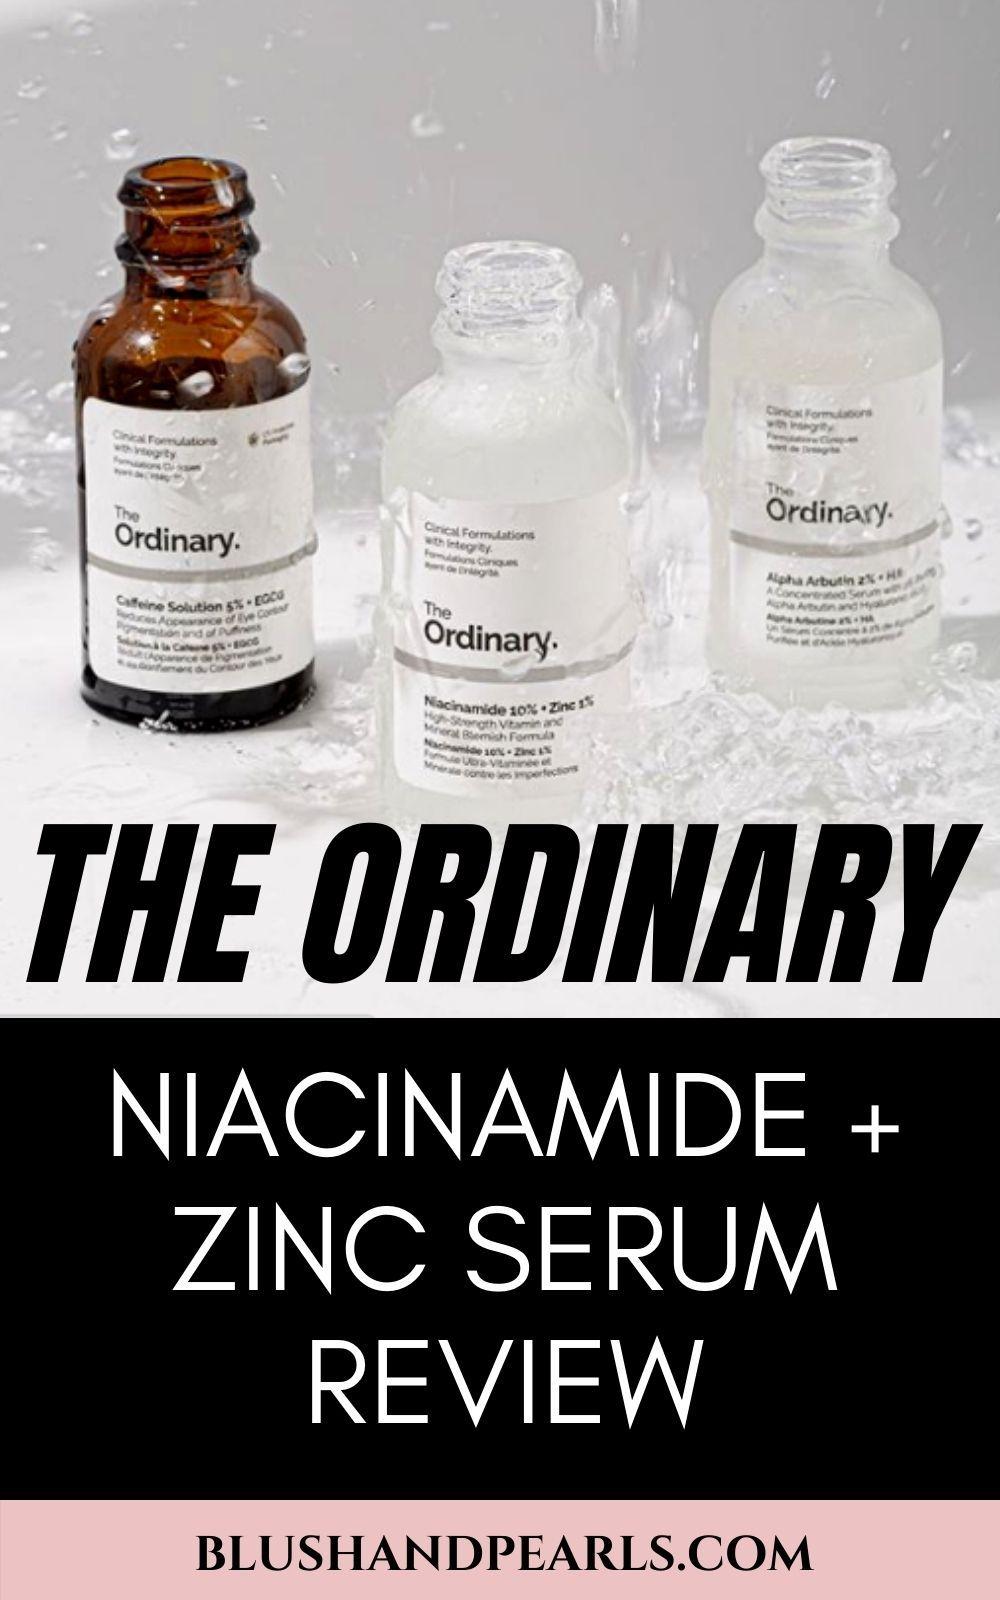 The Ordinary Niacinamide 10 + Zinc 1 For Oil + Pore